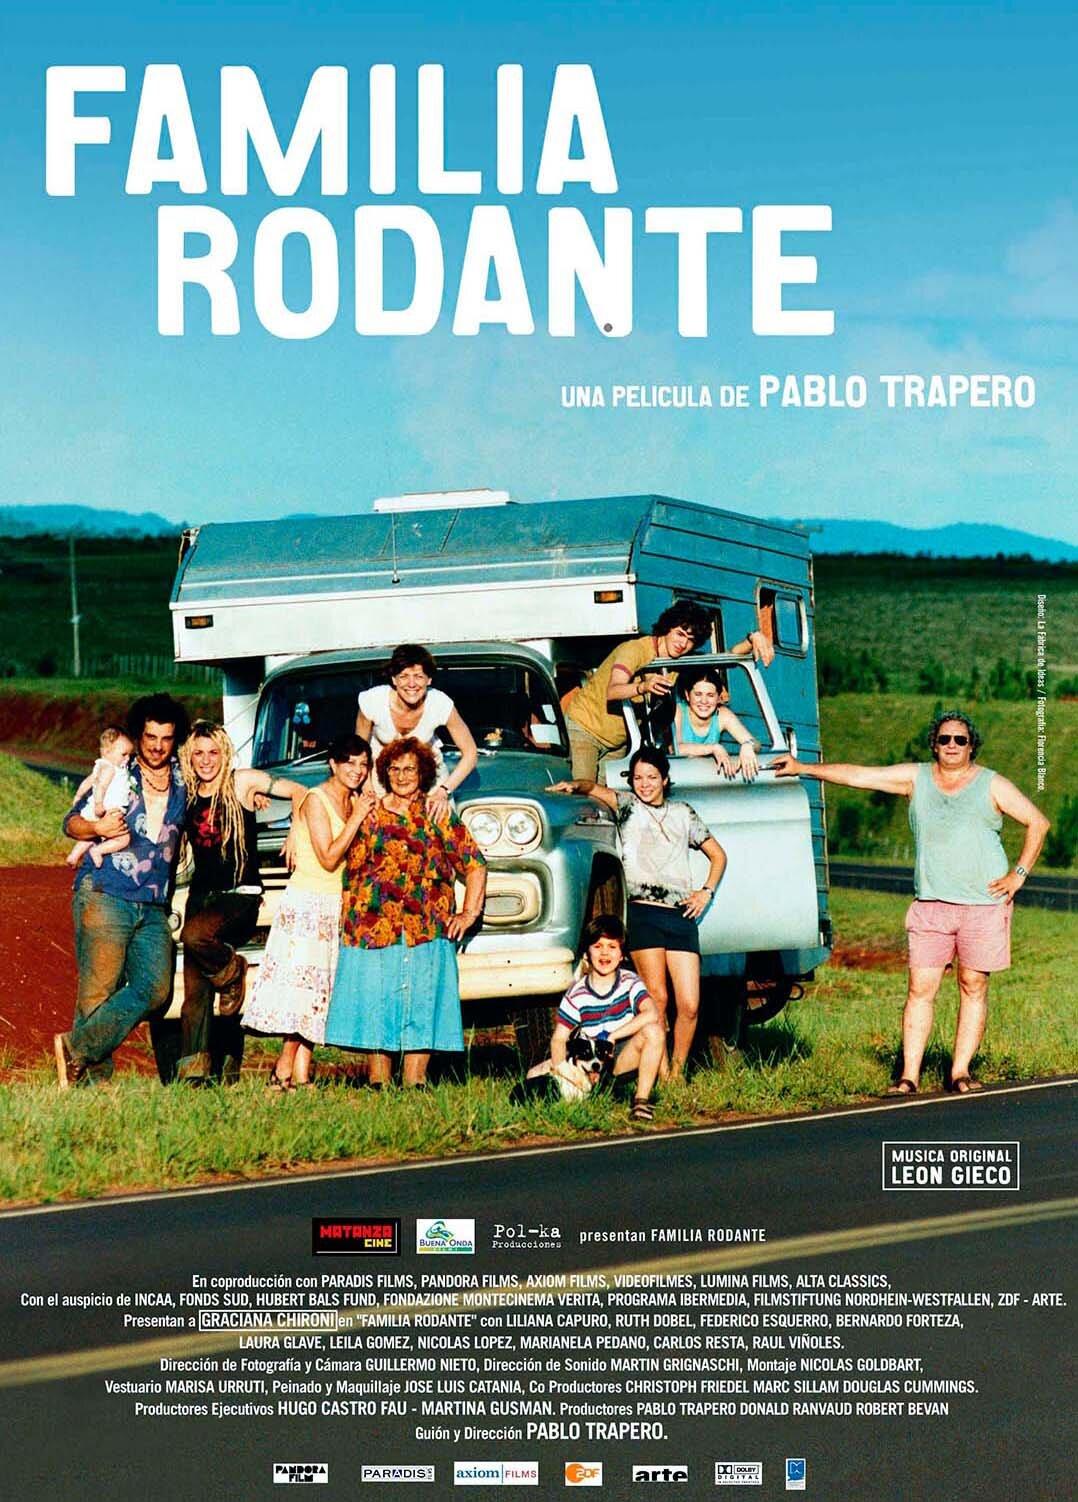 41 Familia Rodante (Pablo Trapero).jpg